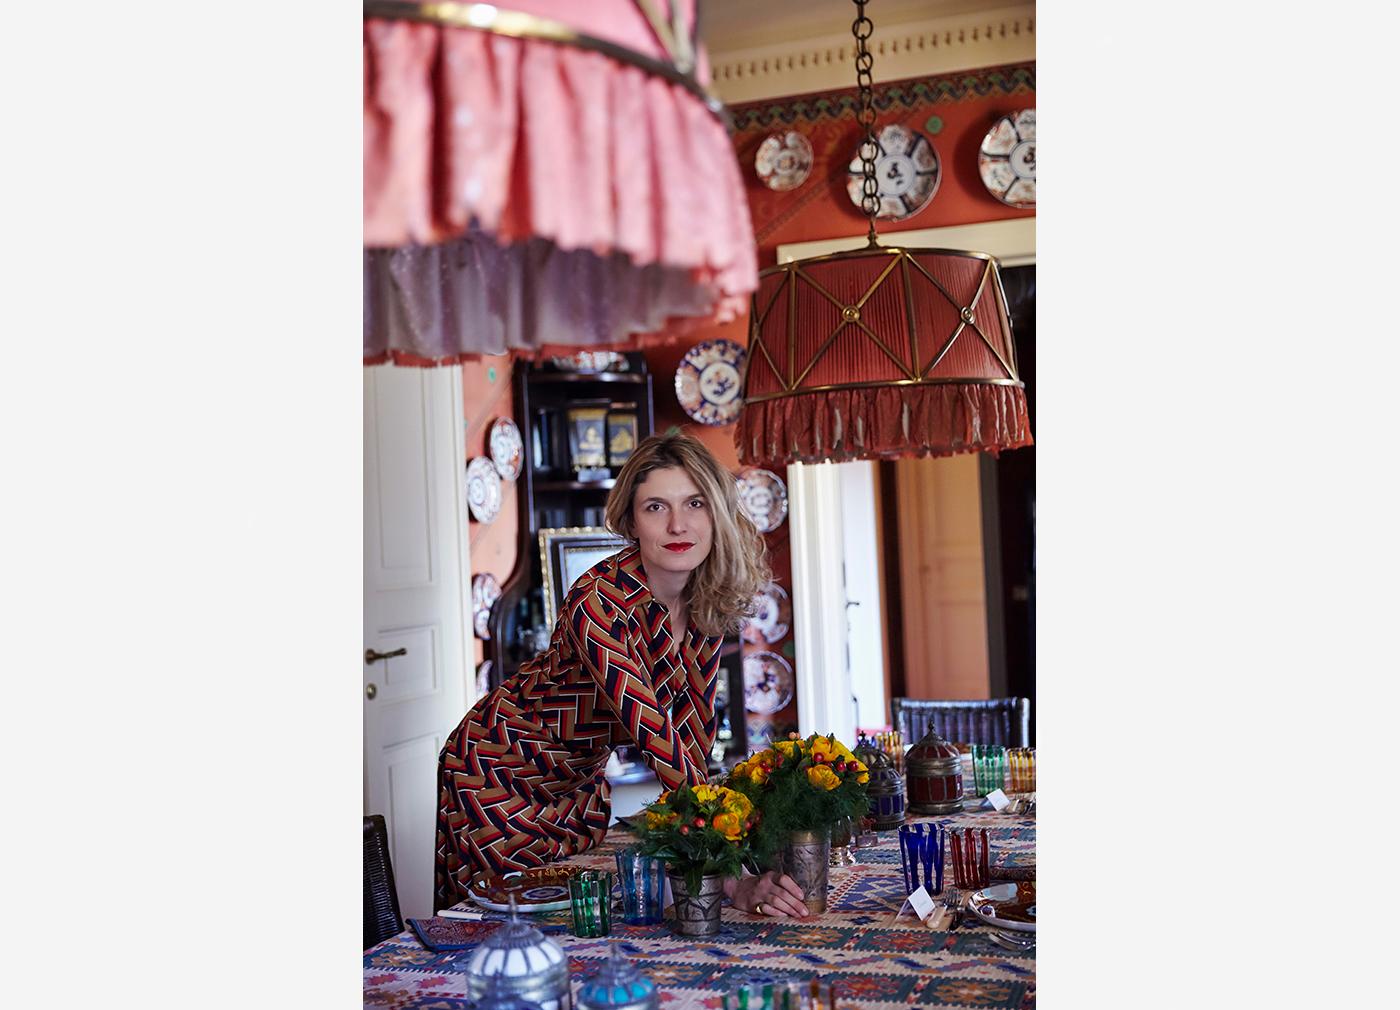 Cabana Magazine founder Martina Mondadori